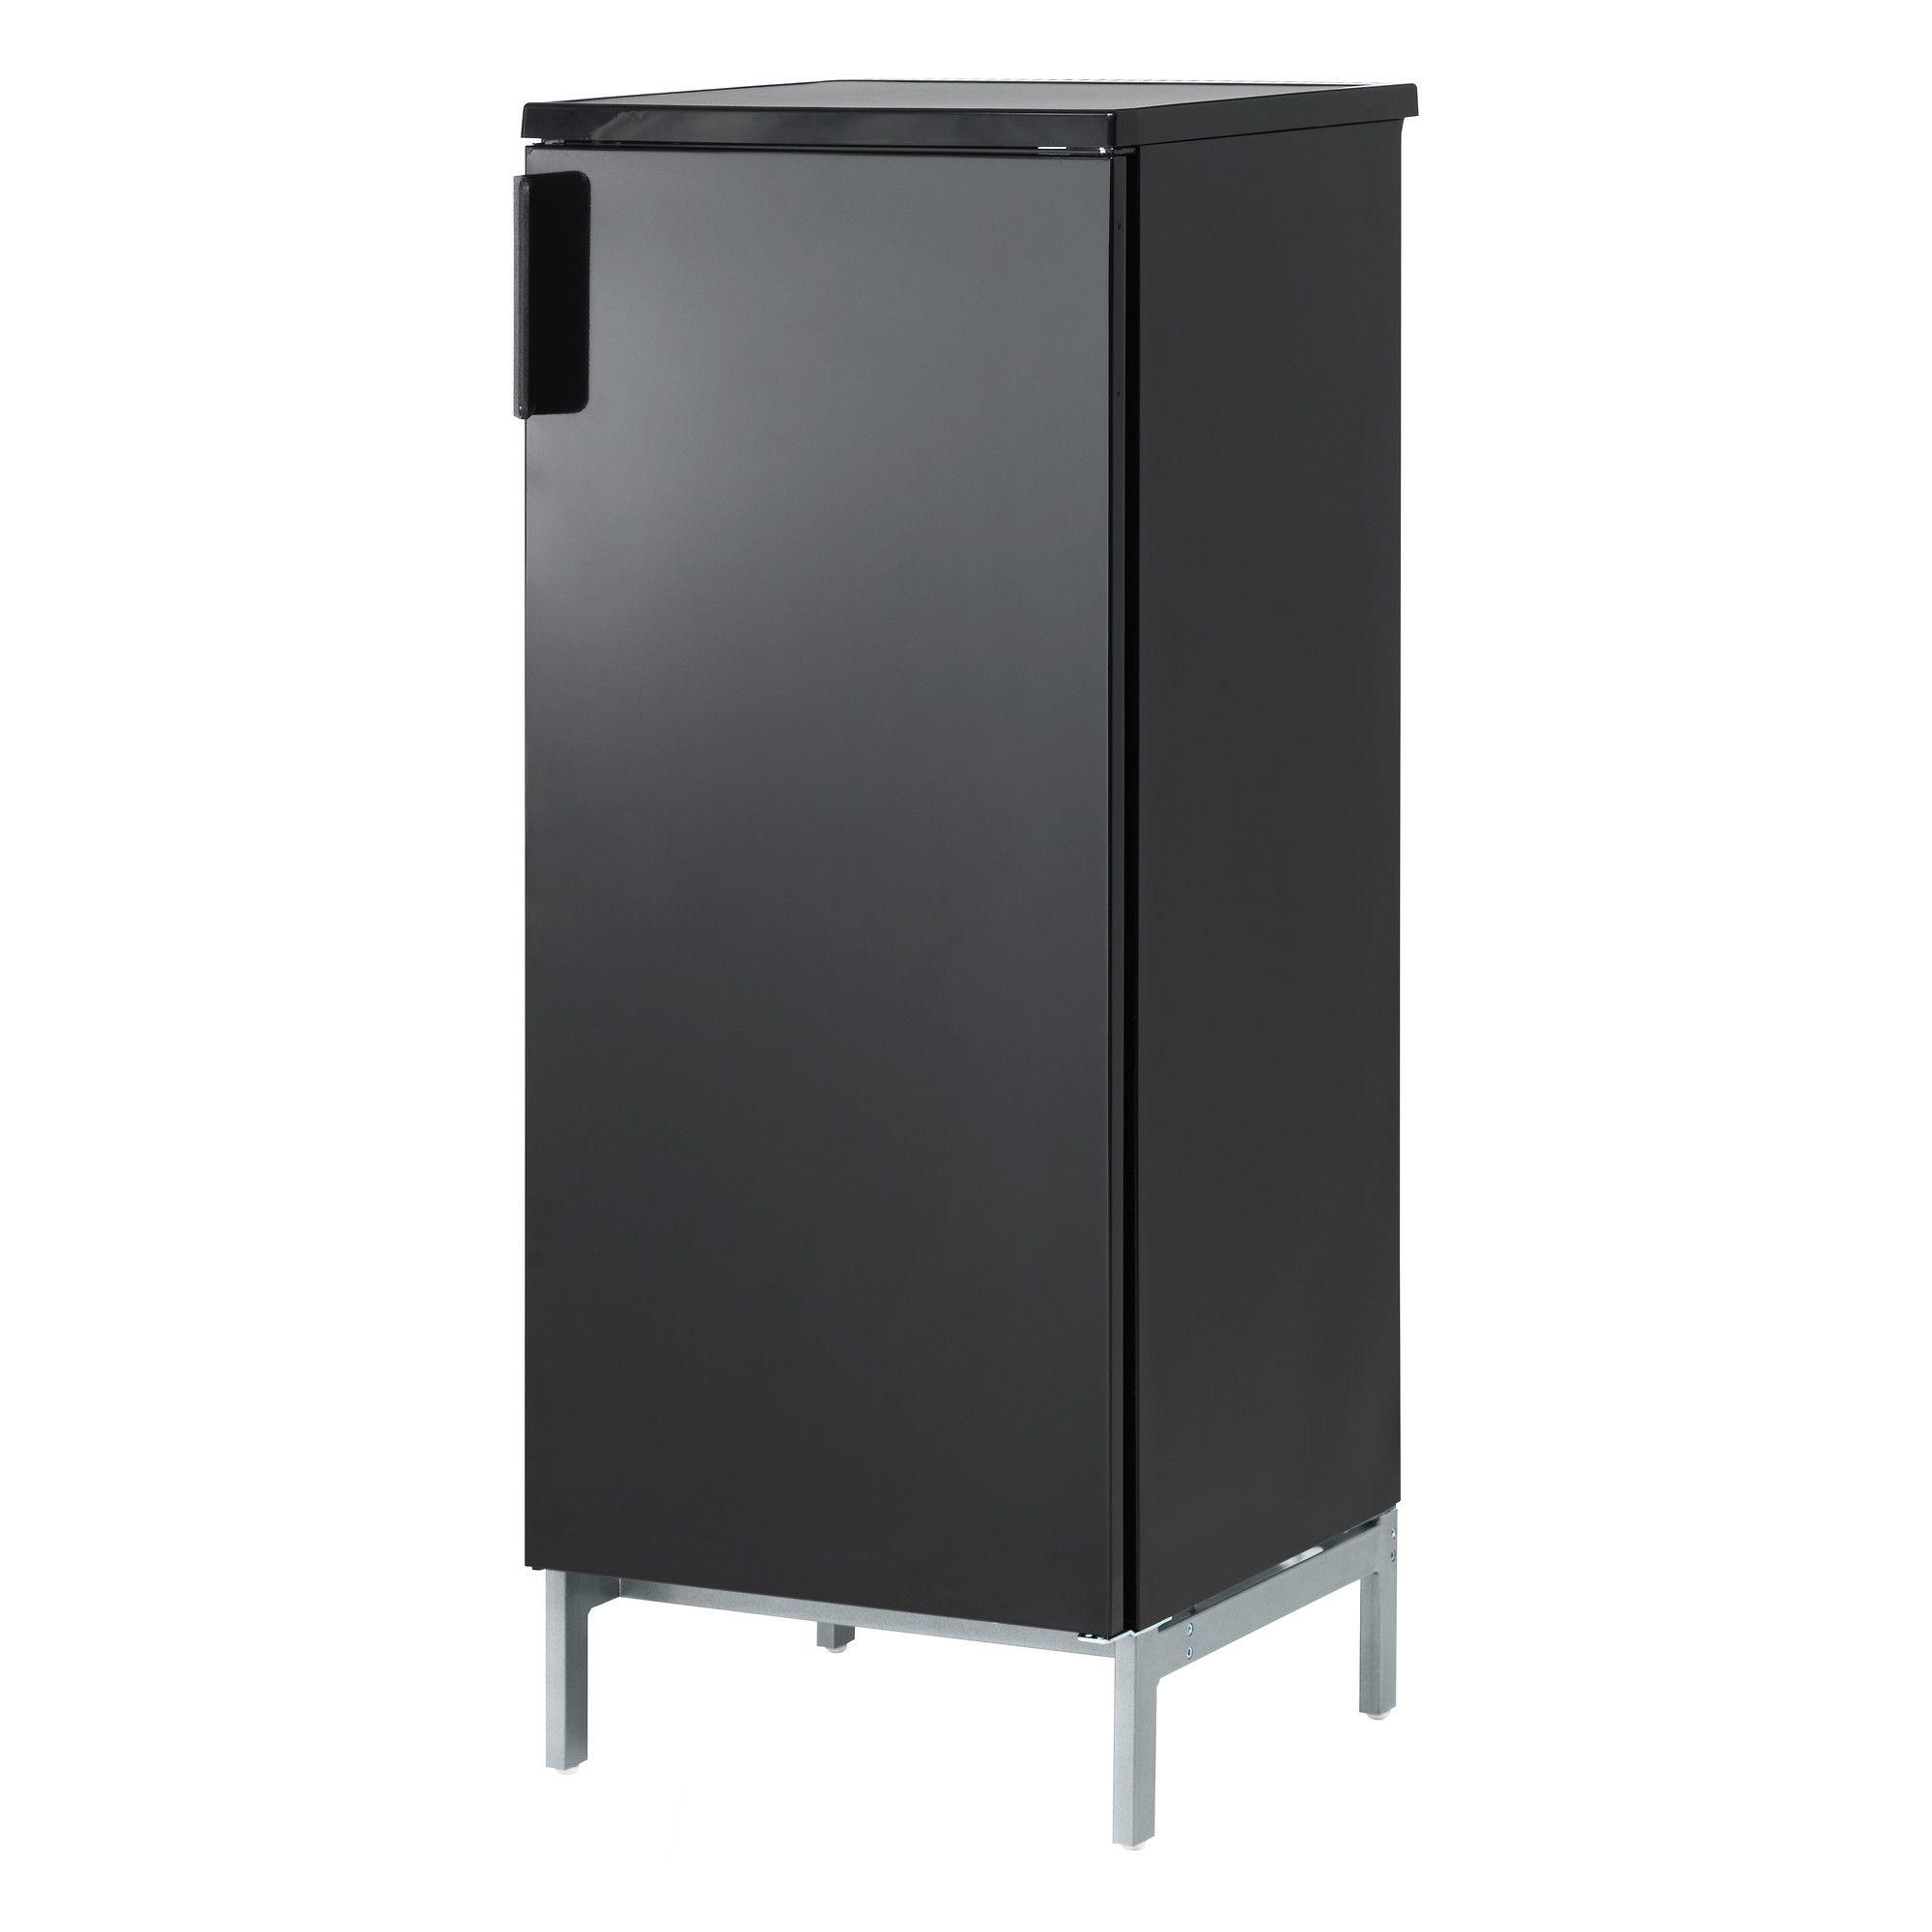 udden fc213 18 fridge ikea interiors pinterest ikea ikea kitchens and kitchen. Black Bedroom Furniture Sets. Home Design Ideas